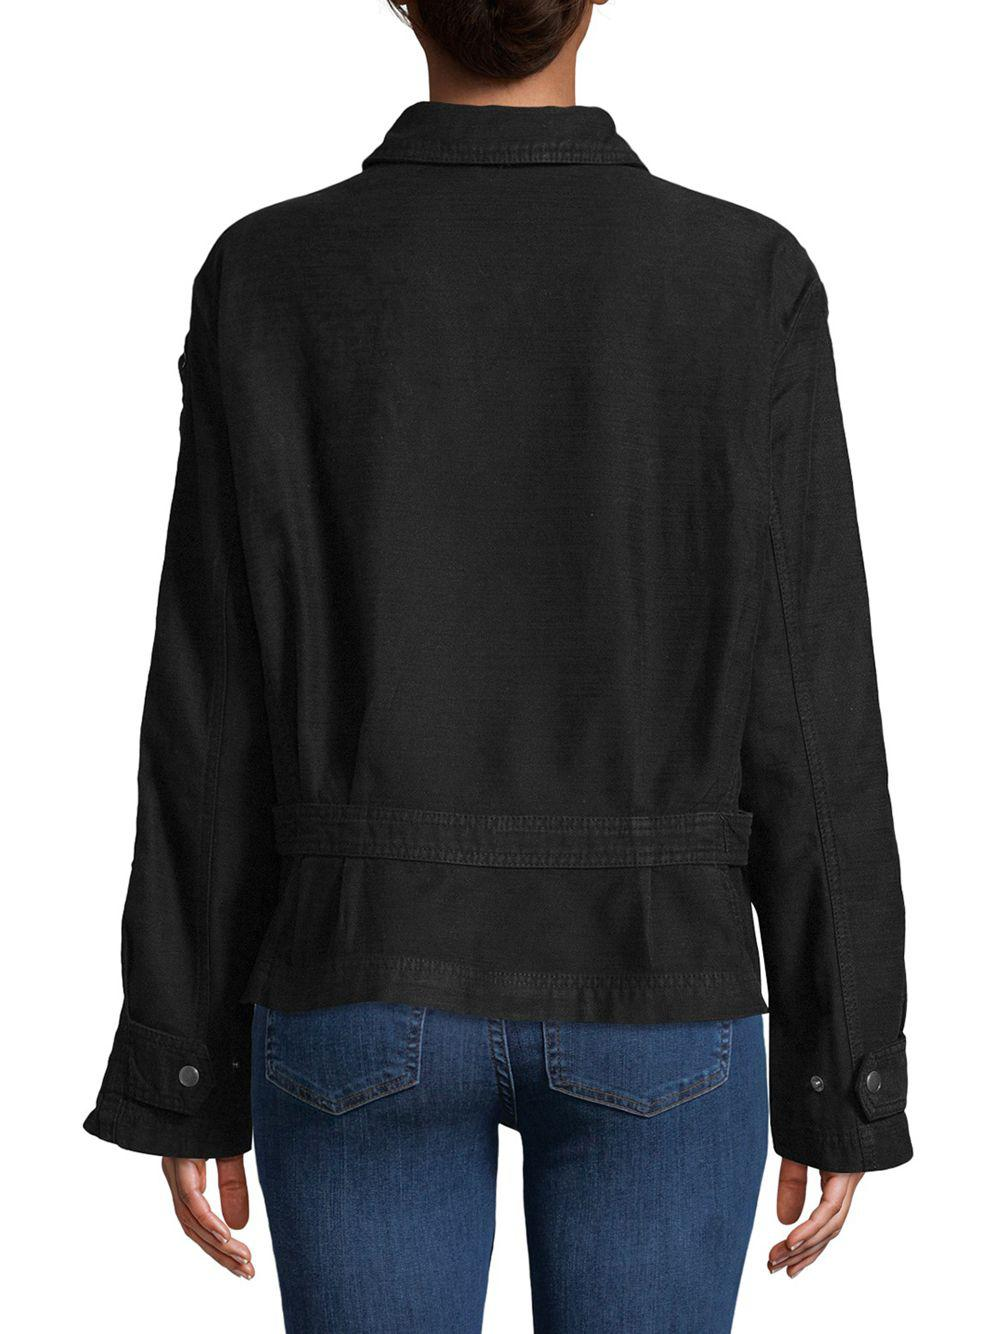 65037faeca Free People - Black Faye Collared Cotton Jacket - Lyst. View fullscreen